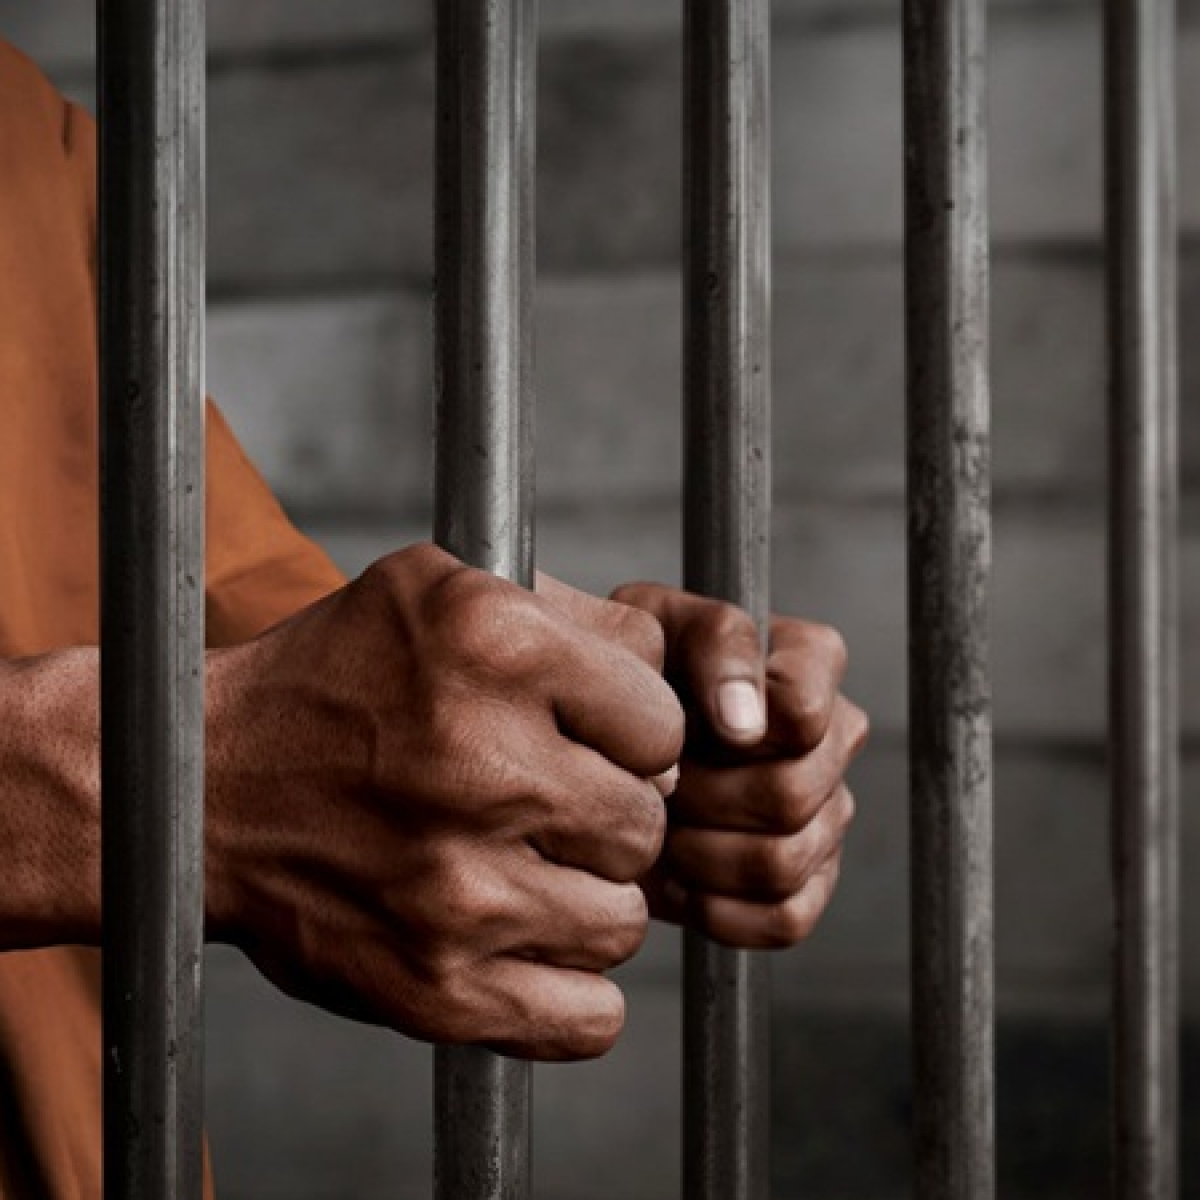 Mumbai: 31-year-old man arrested for killing stray dog in Goregaon